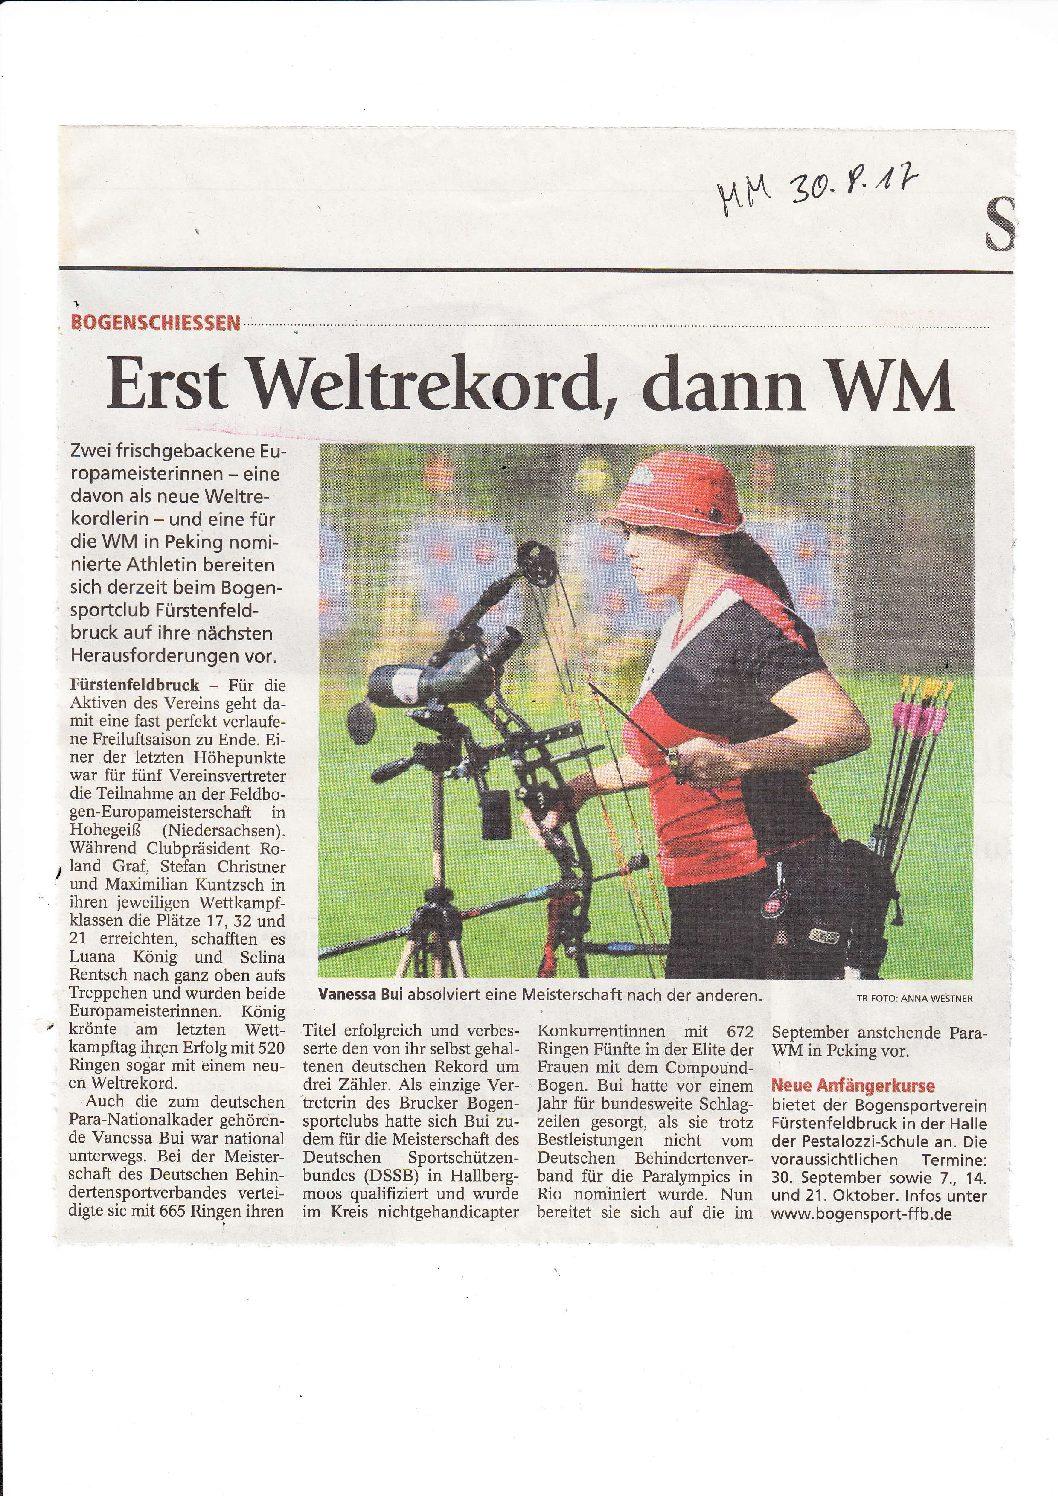 Artikel Münchner Merkur 30.08.2017